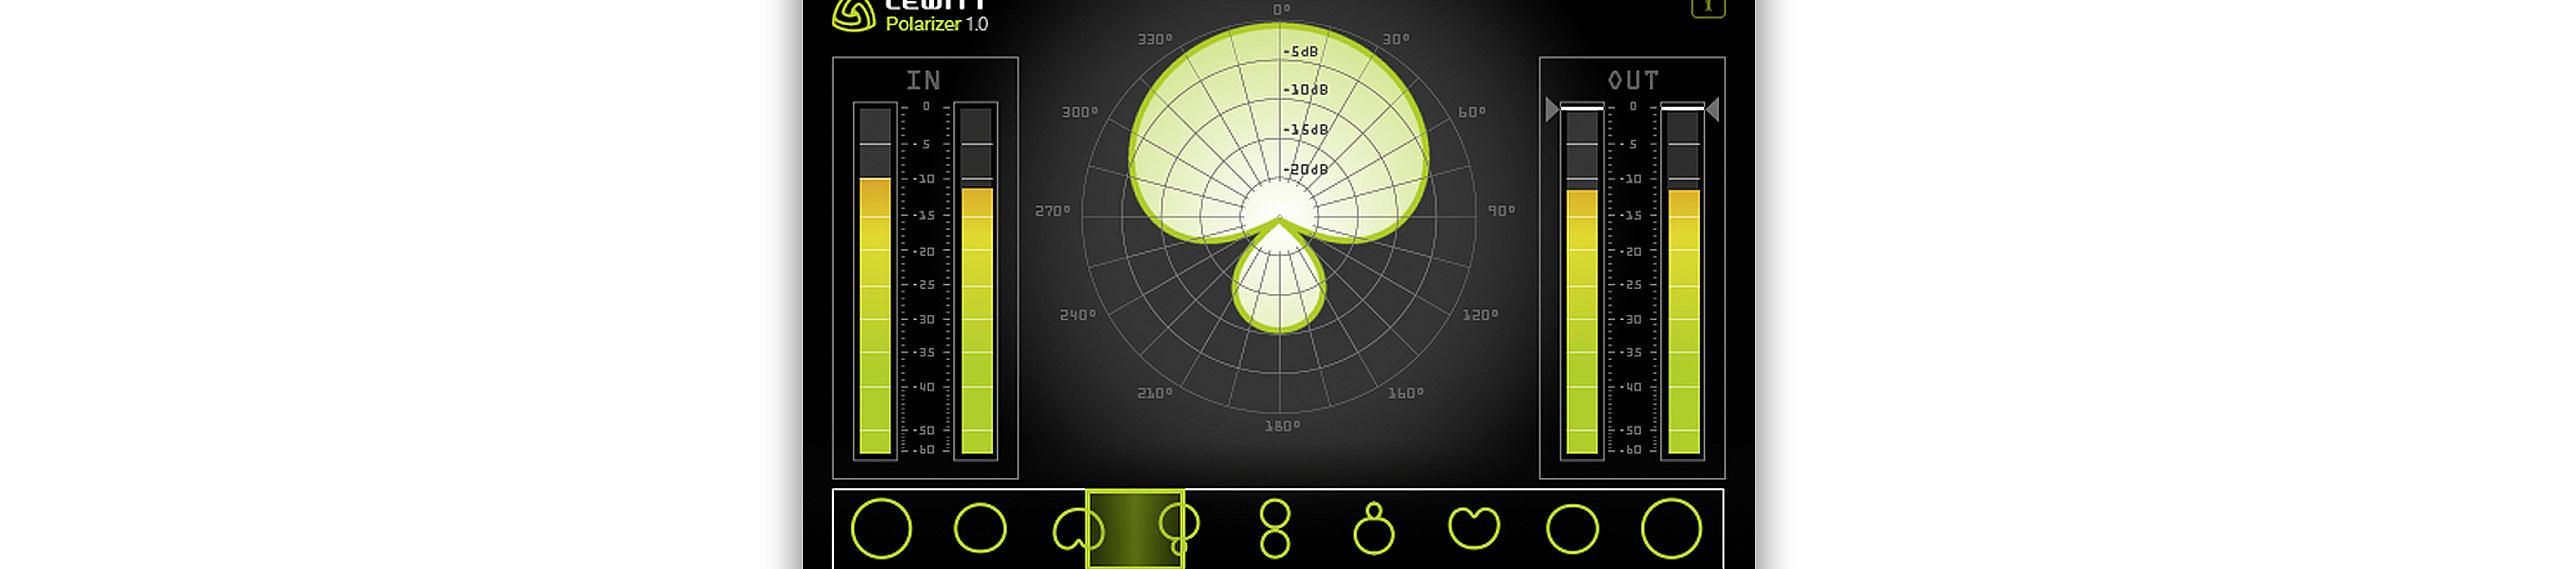 LCT 640 TS polarizer plugin